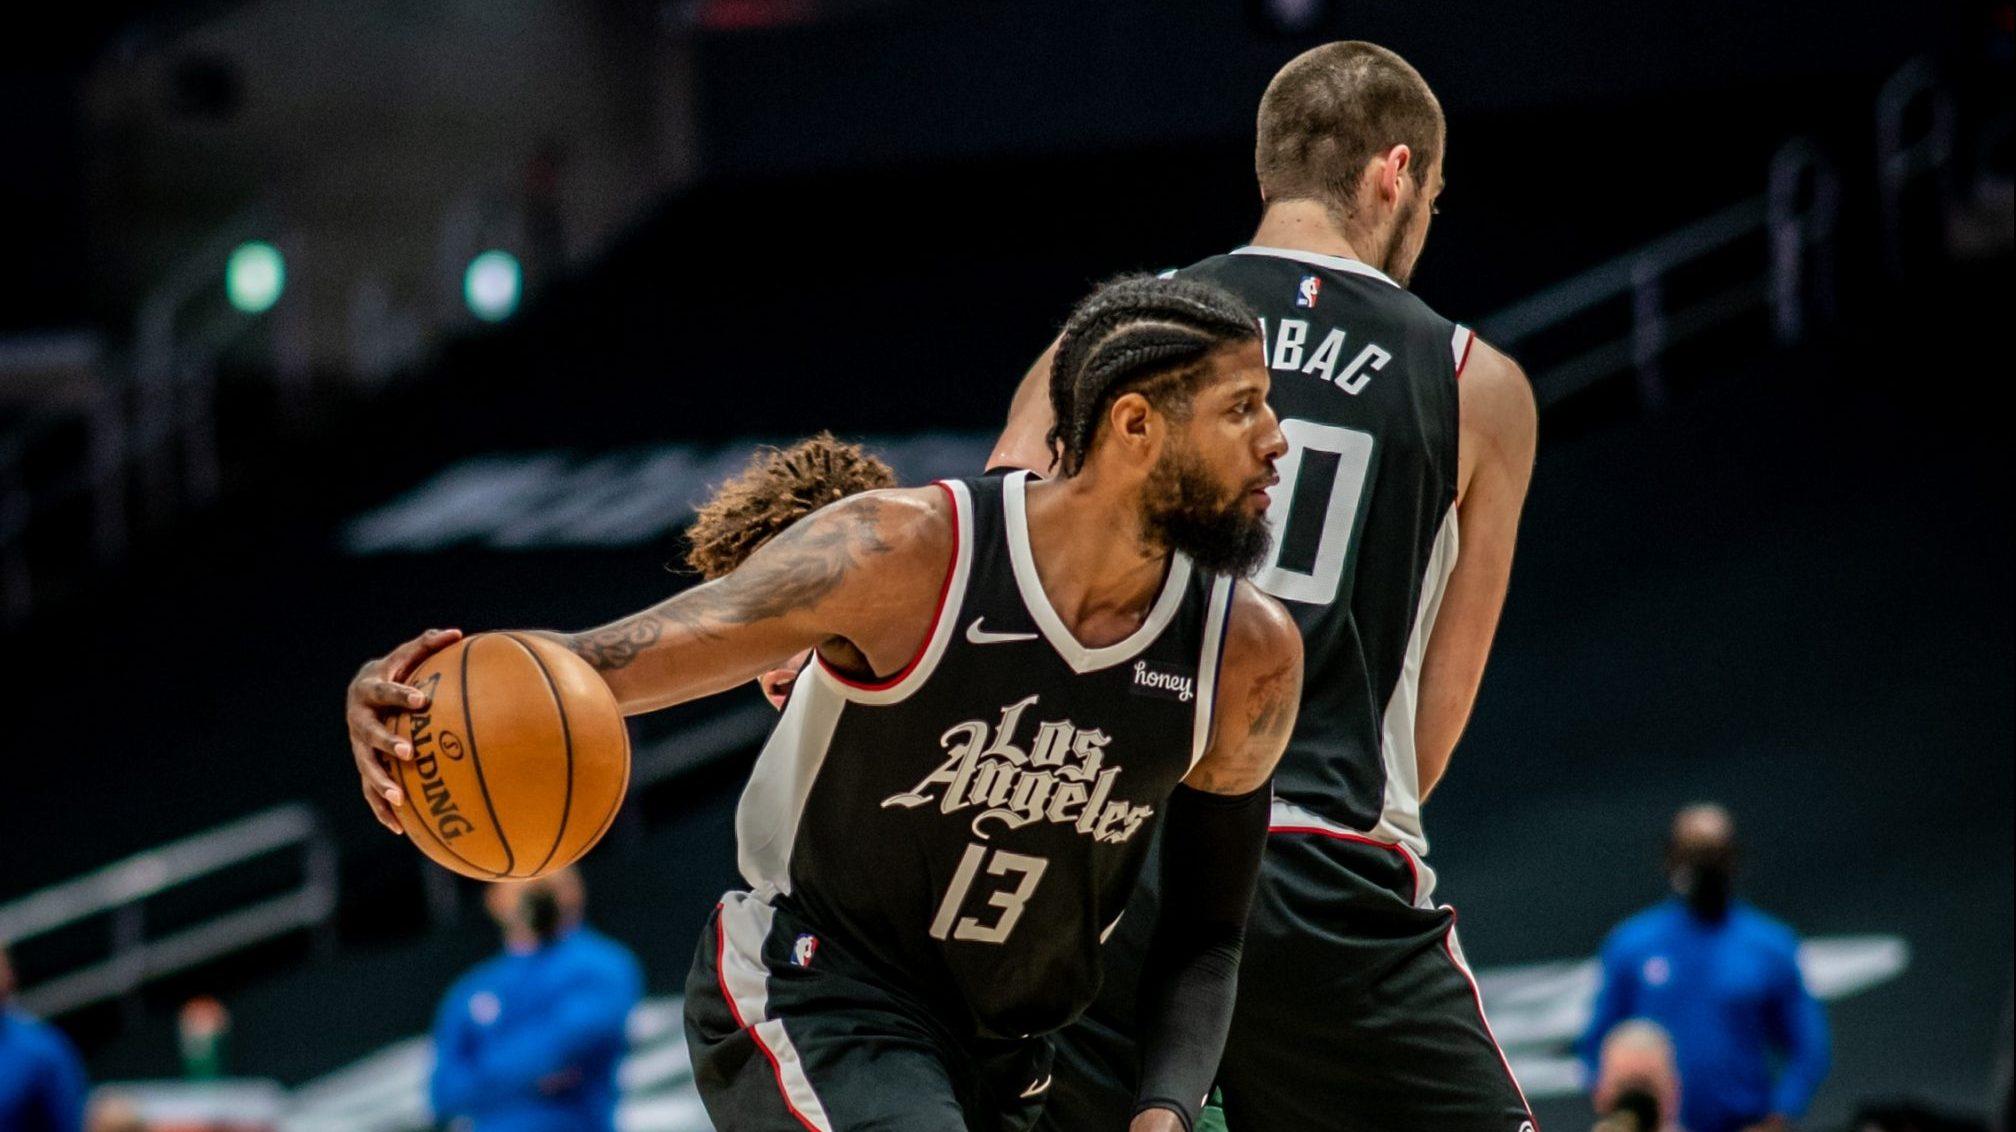 Clippers vs. Mavericks Game 2 Preview: Regaining Control